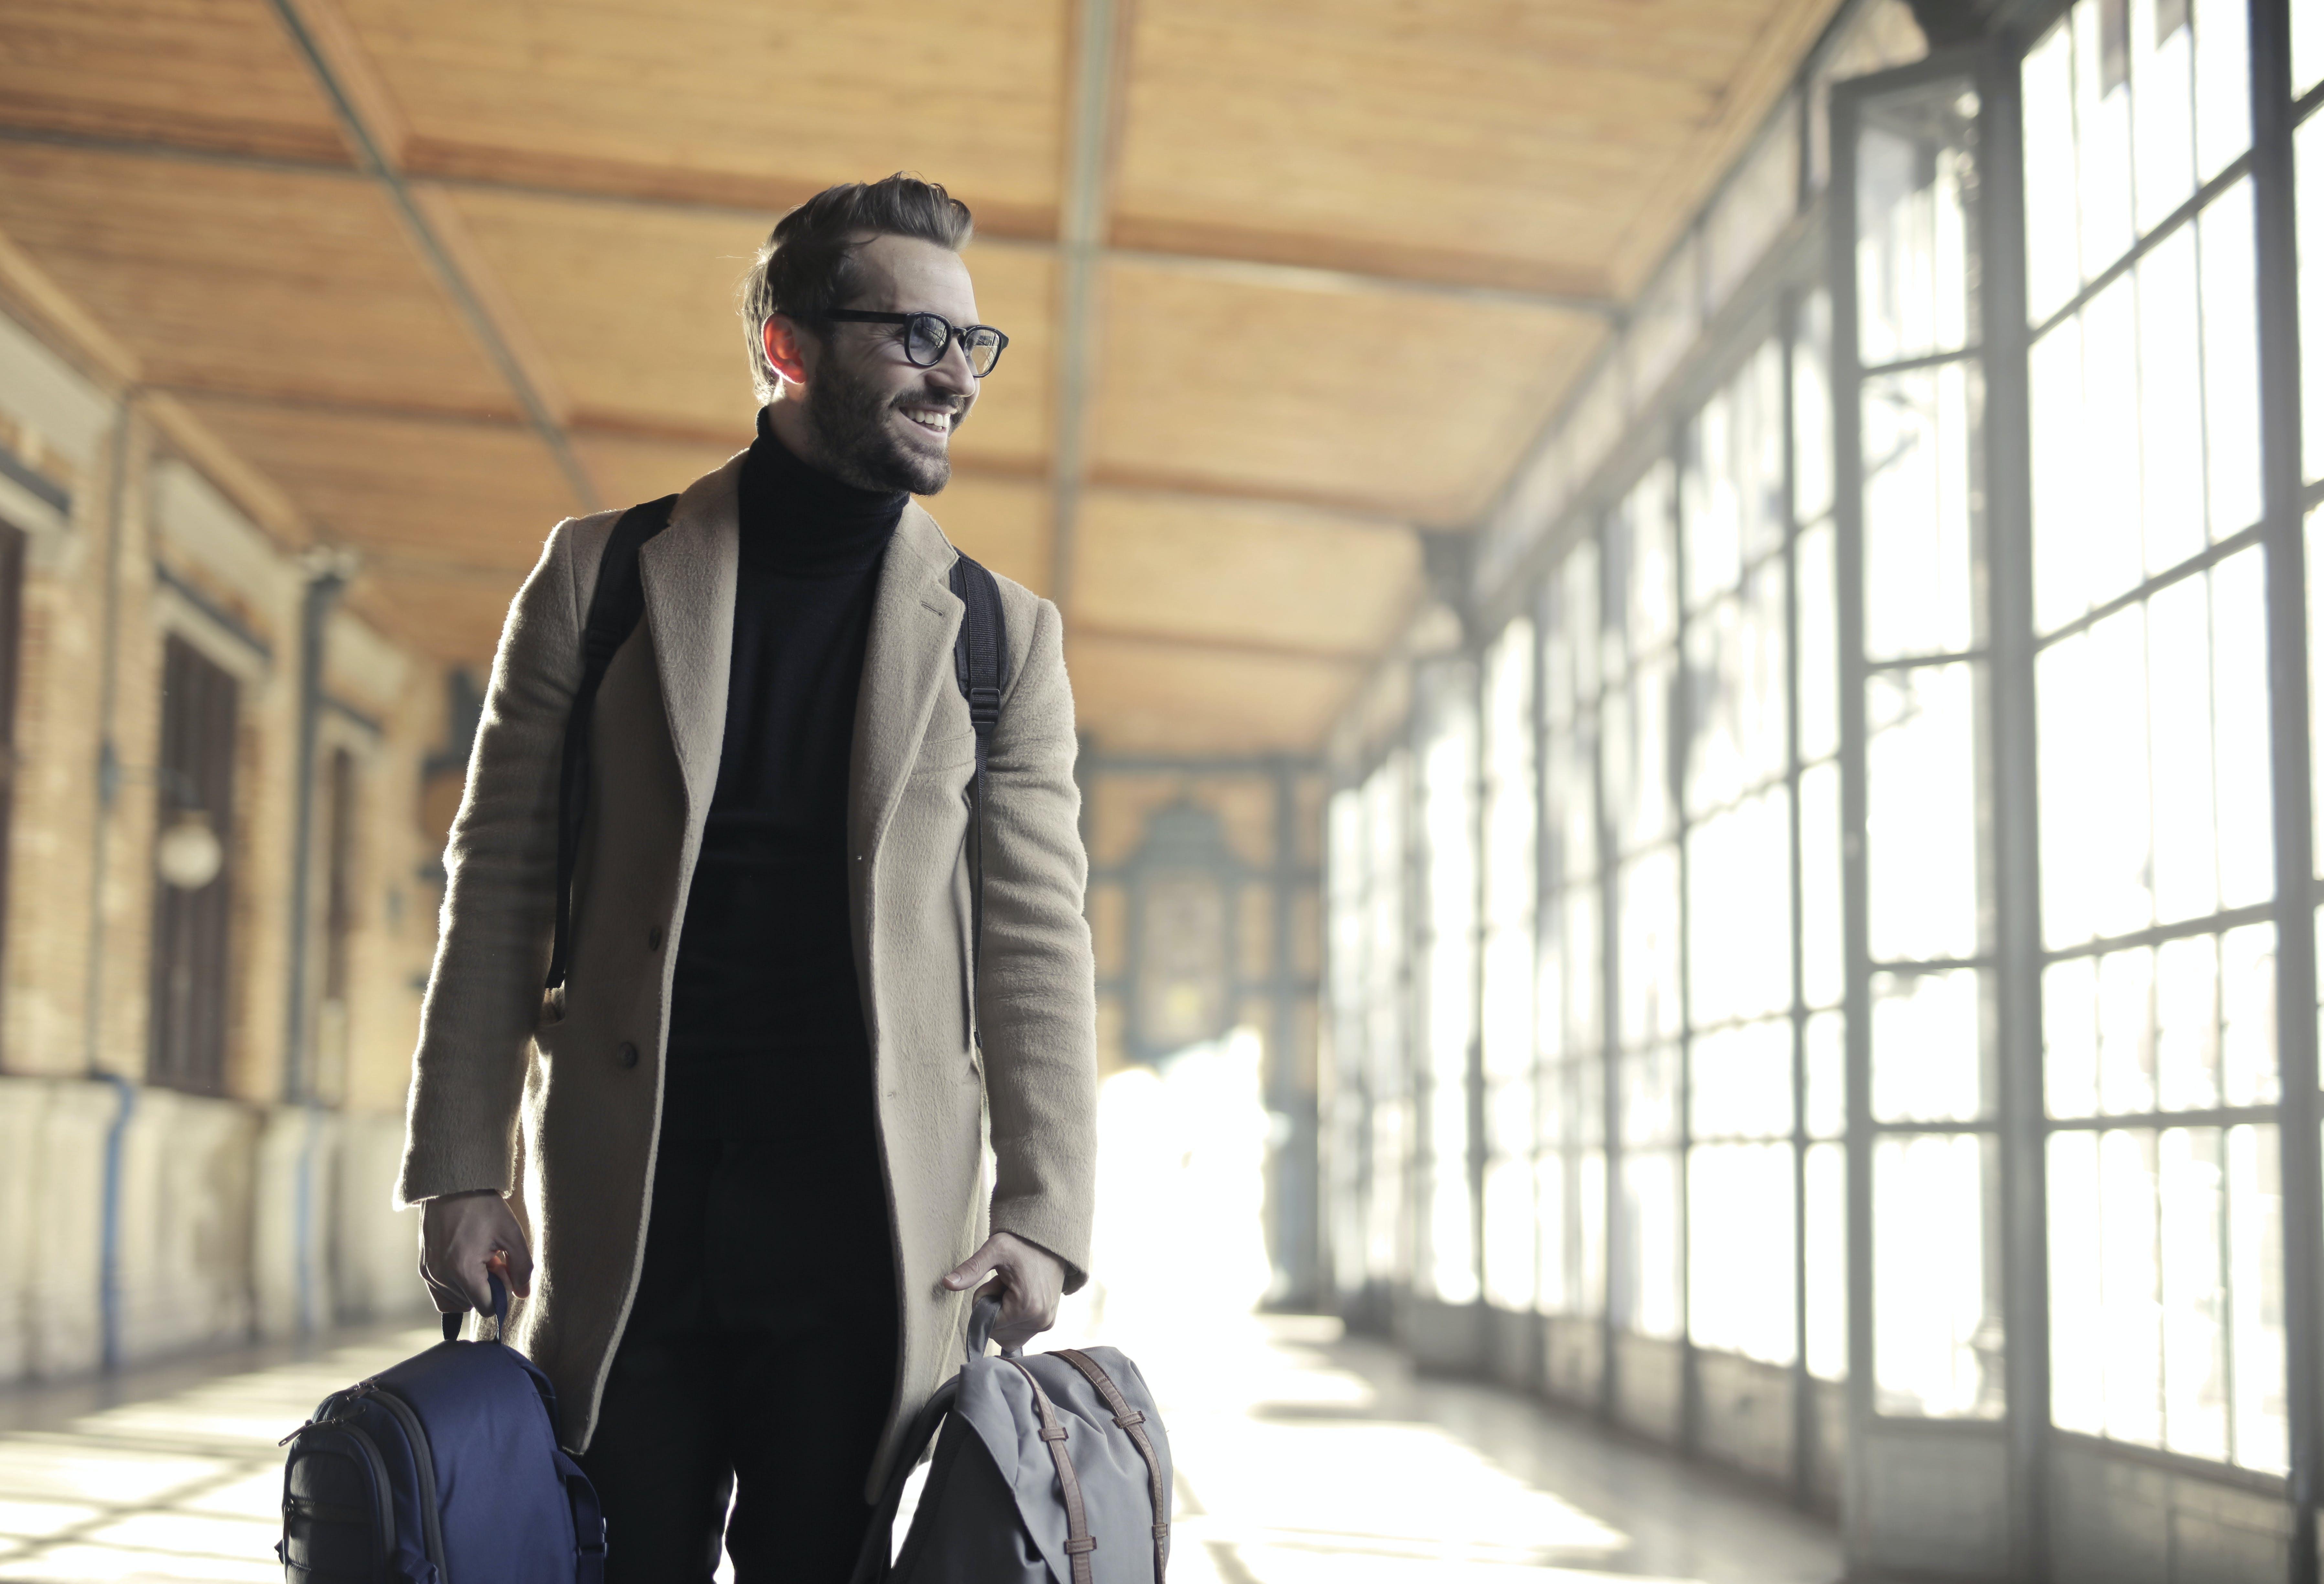 Man in Brown Robe Carrying Bag Smiling